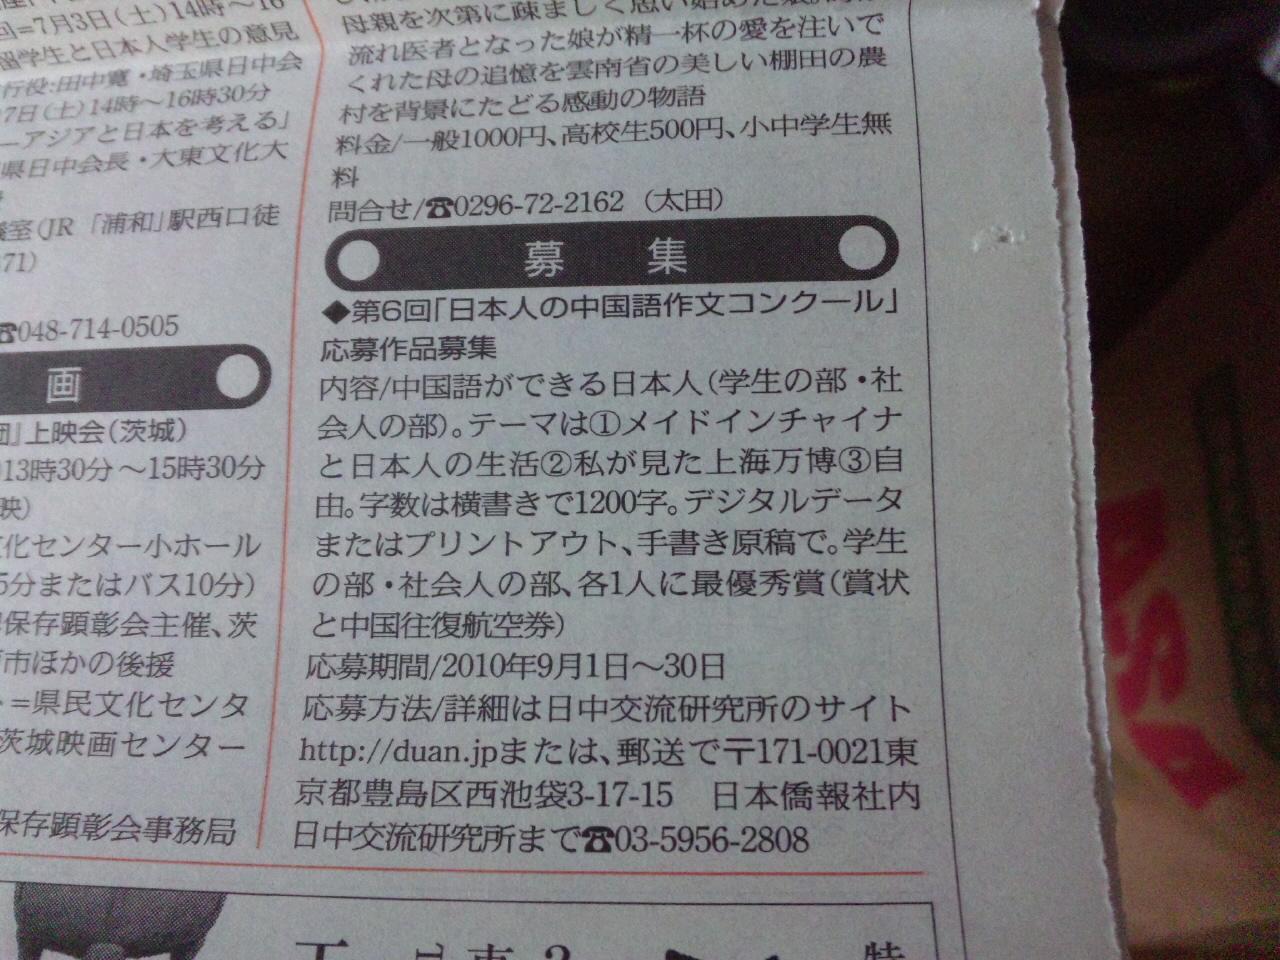 第六回日本人の中国語作文コンクール募集要項 日中友好協会機関紙に掲載_d0027795_14505566.jpg